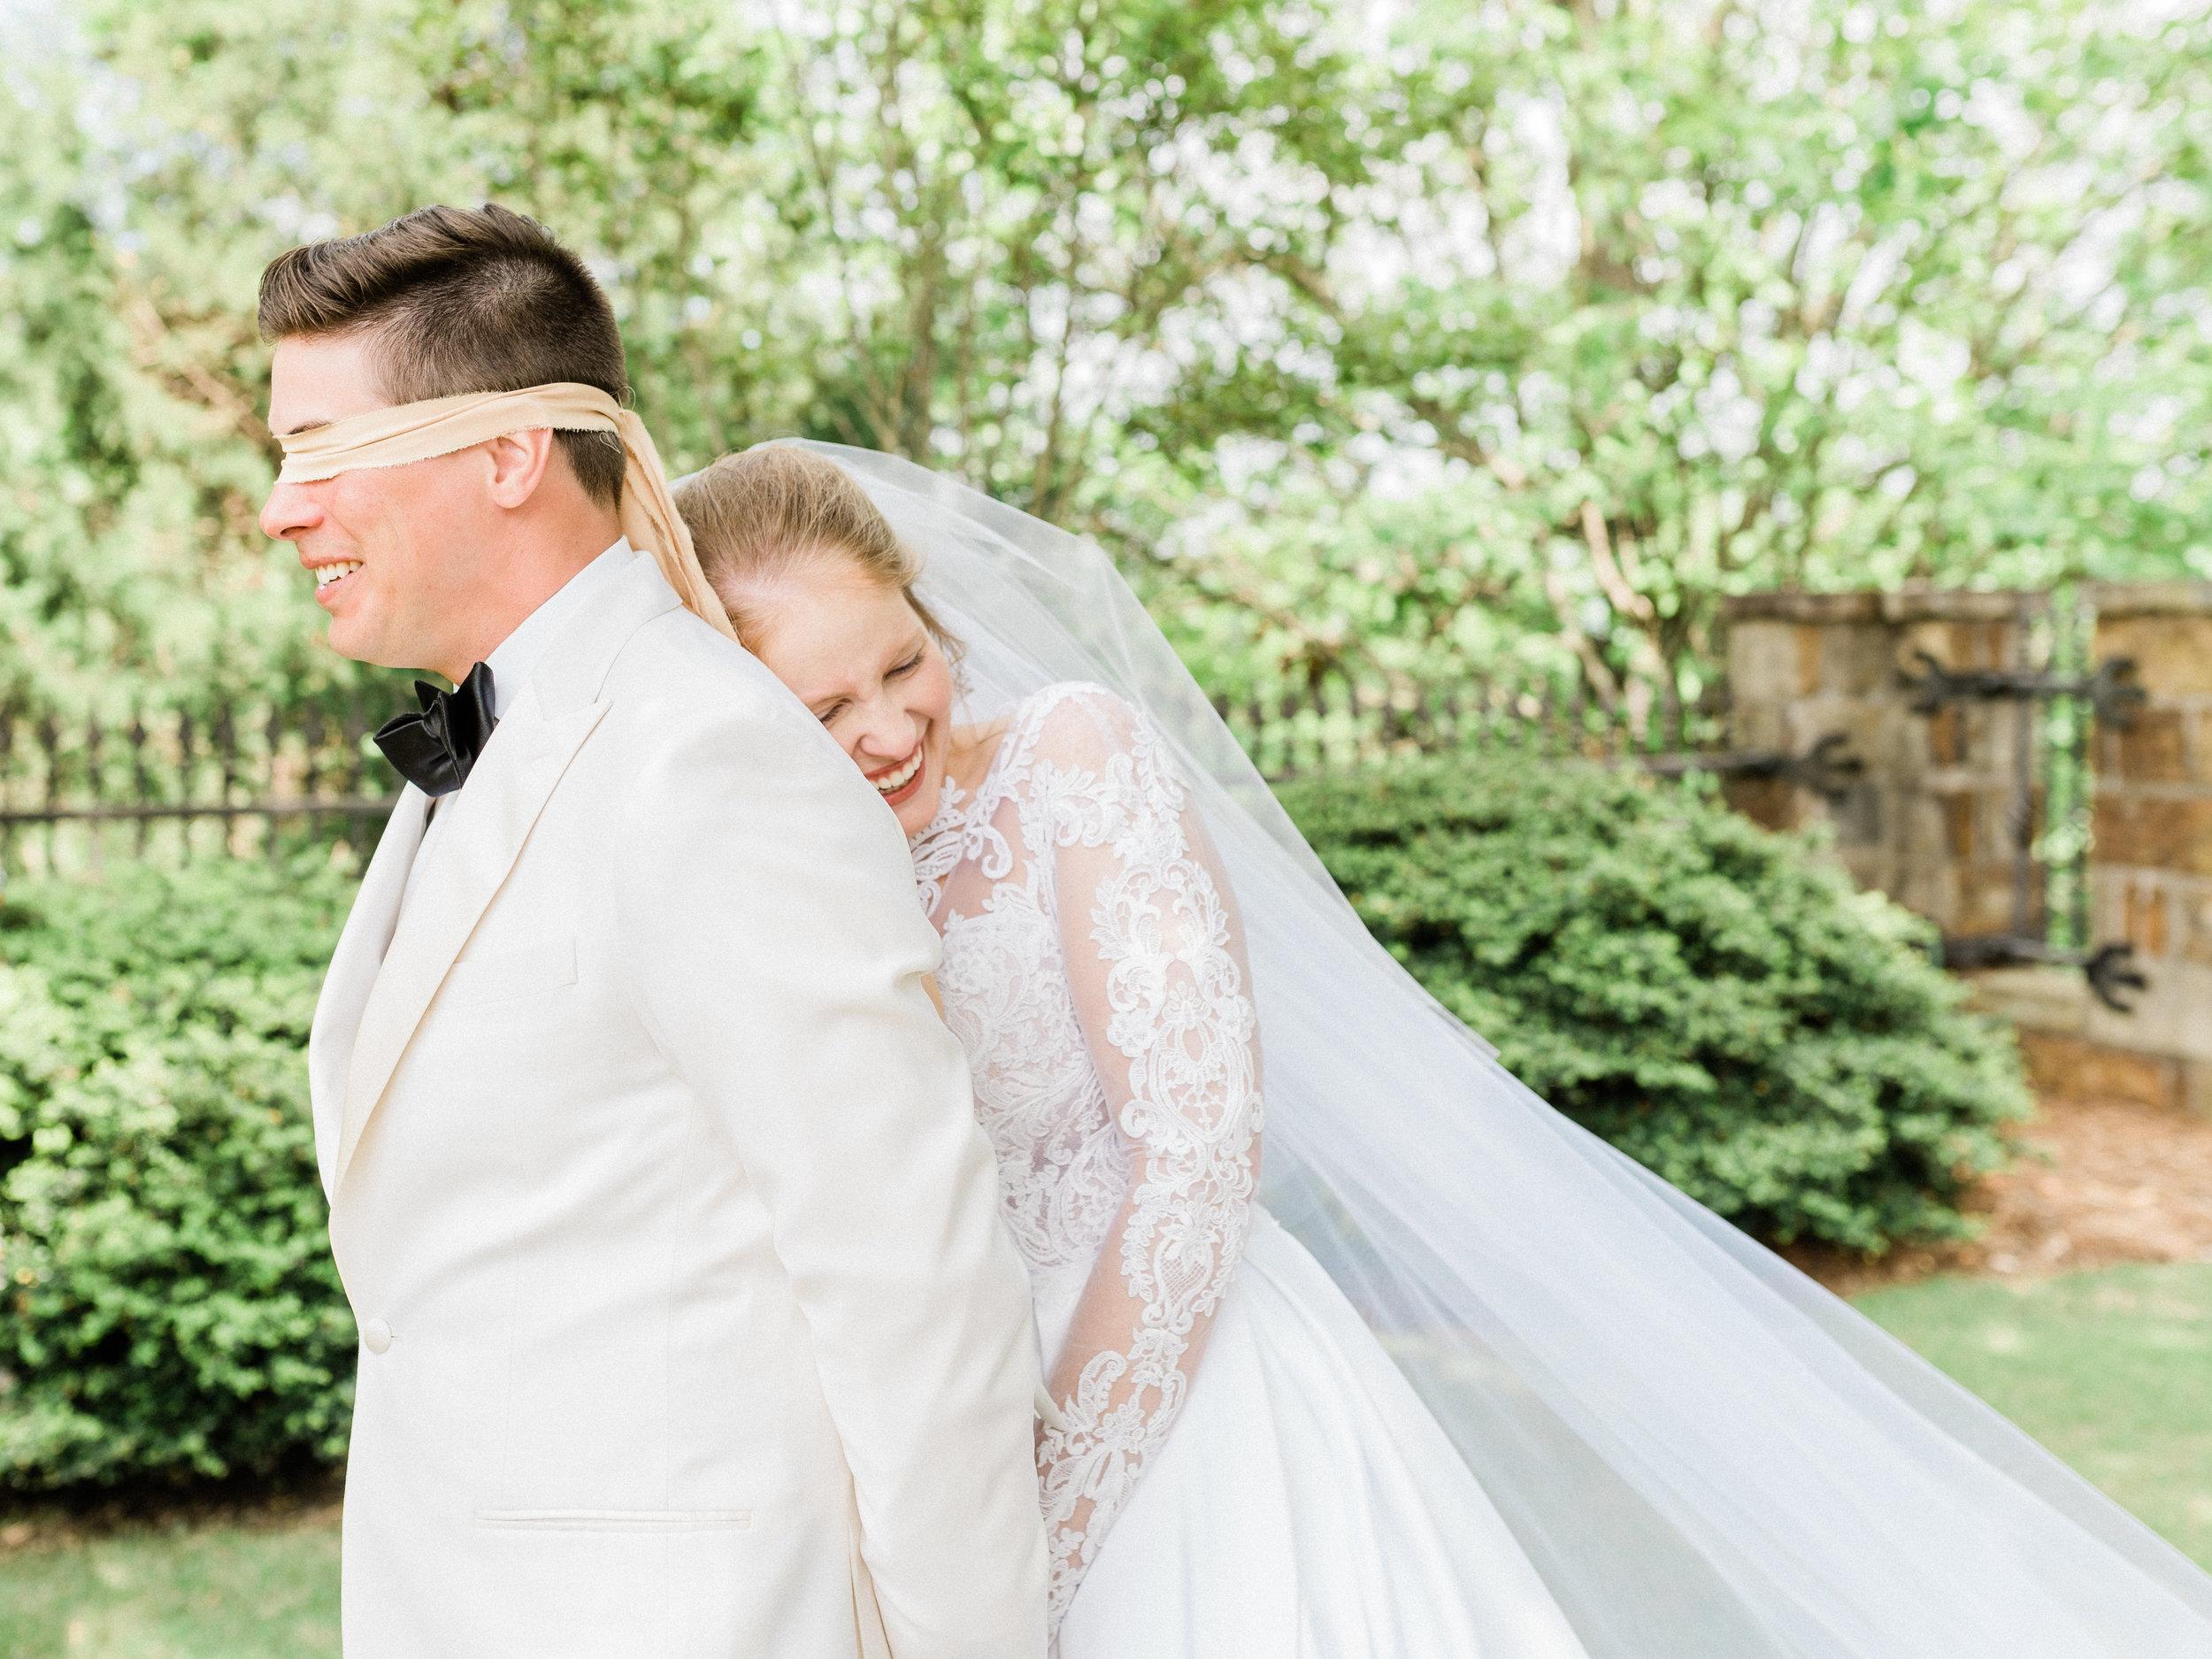 Romantic garden wedding in Little Rock, Arkansas. Wedding photography by wedding photographer Natalie Smith